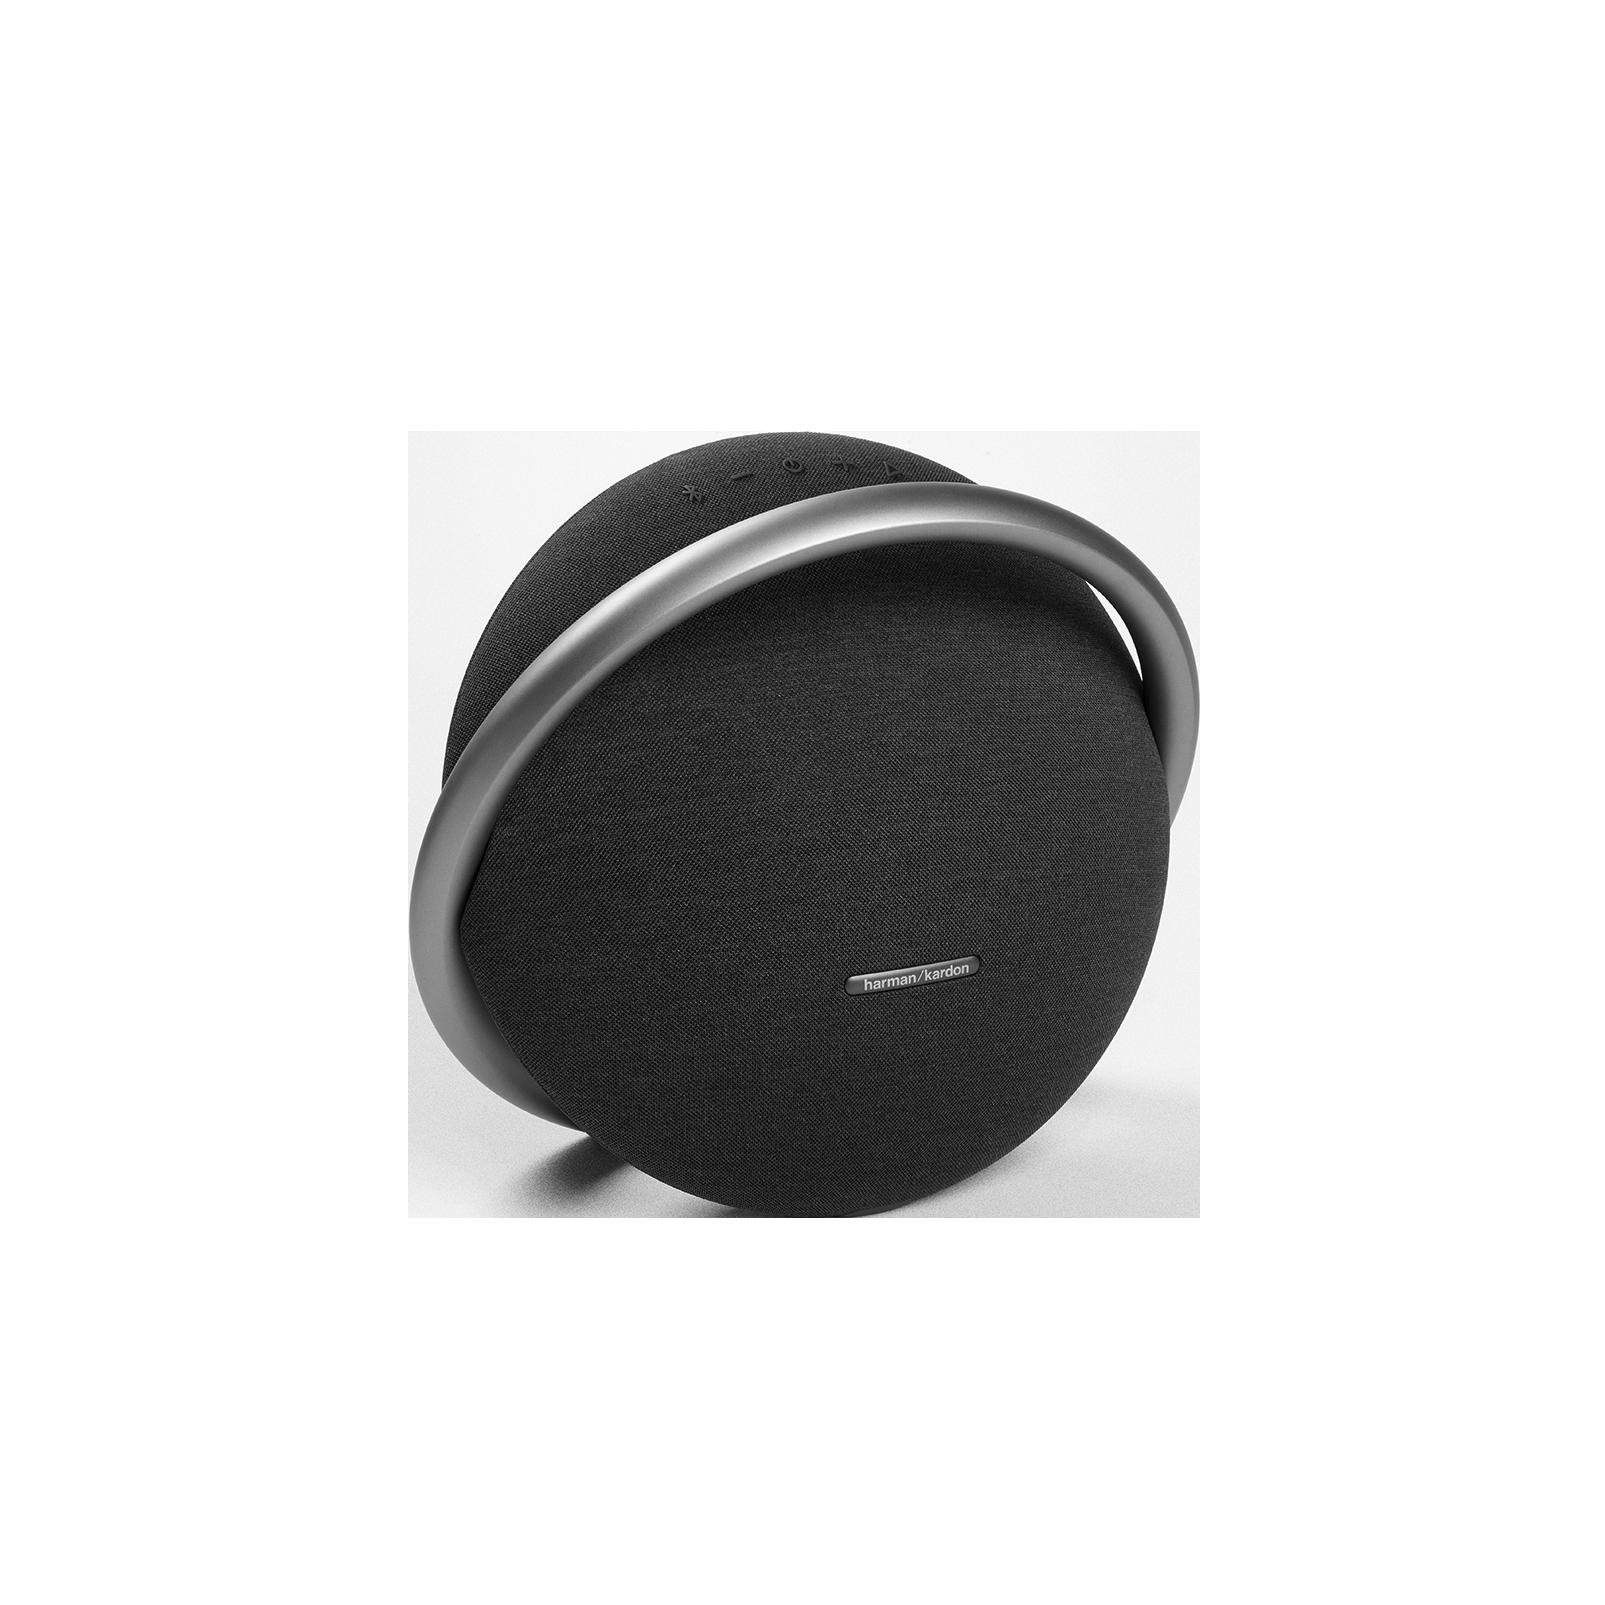 Onyx Studio 7 - Black - Portable Stereo Bluetooth Speaker - Hero